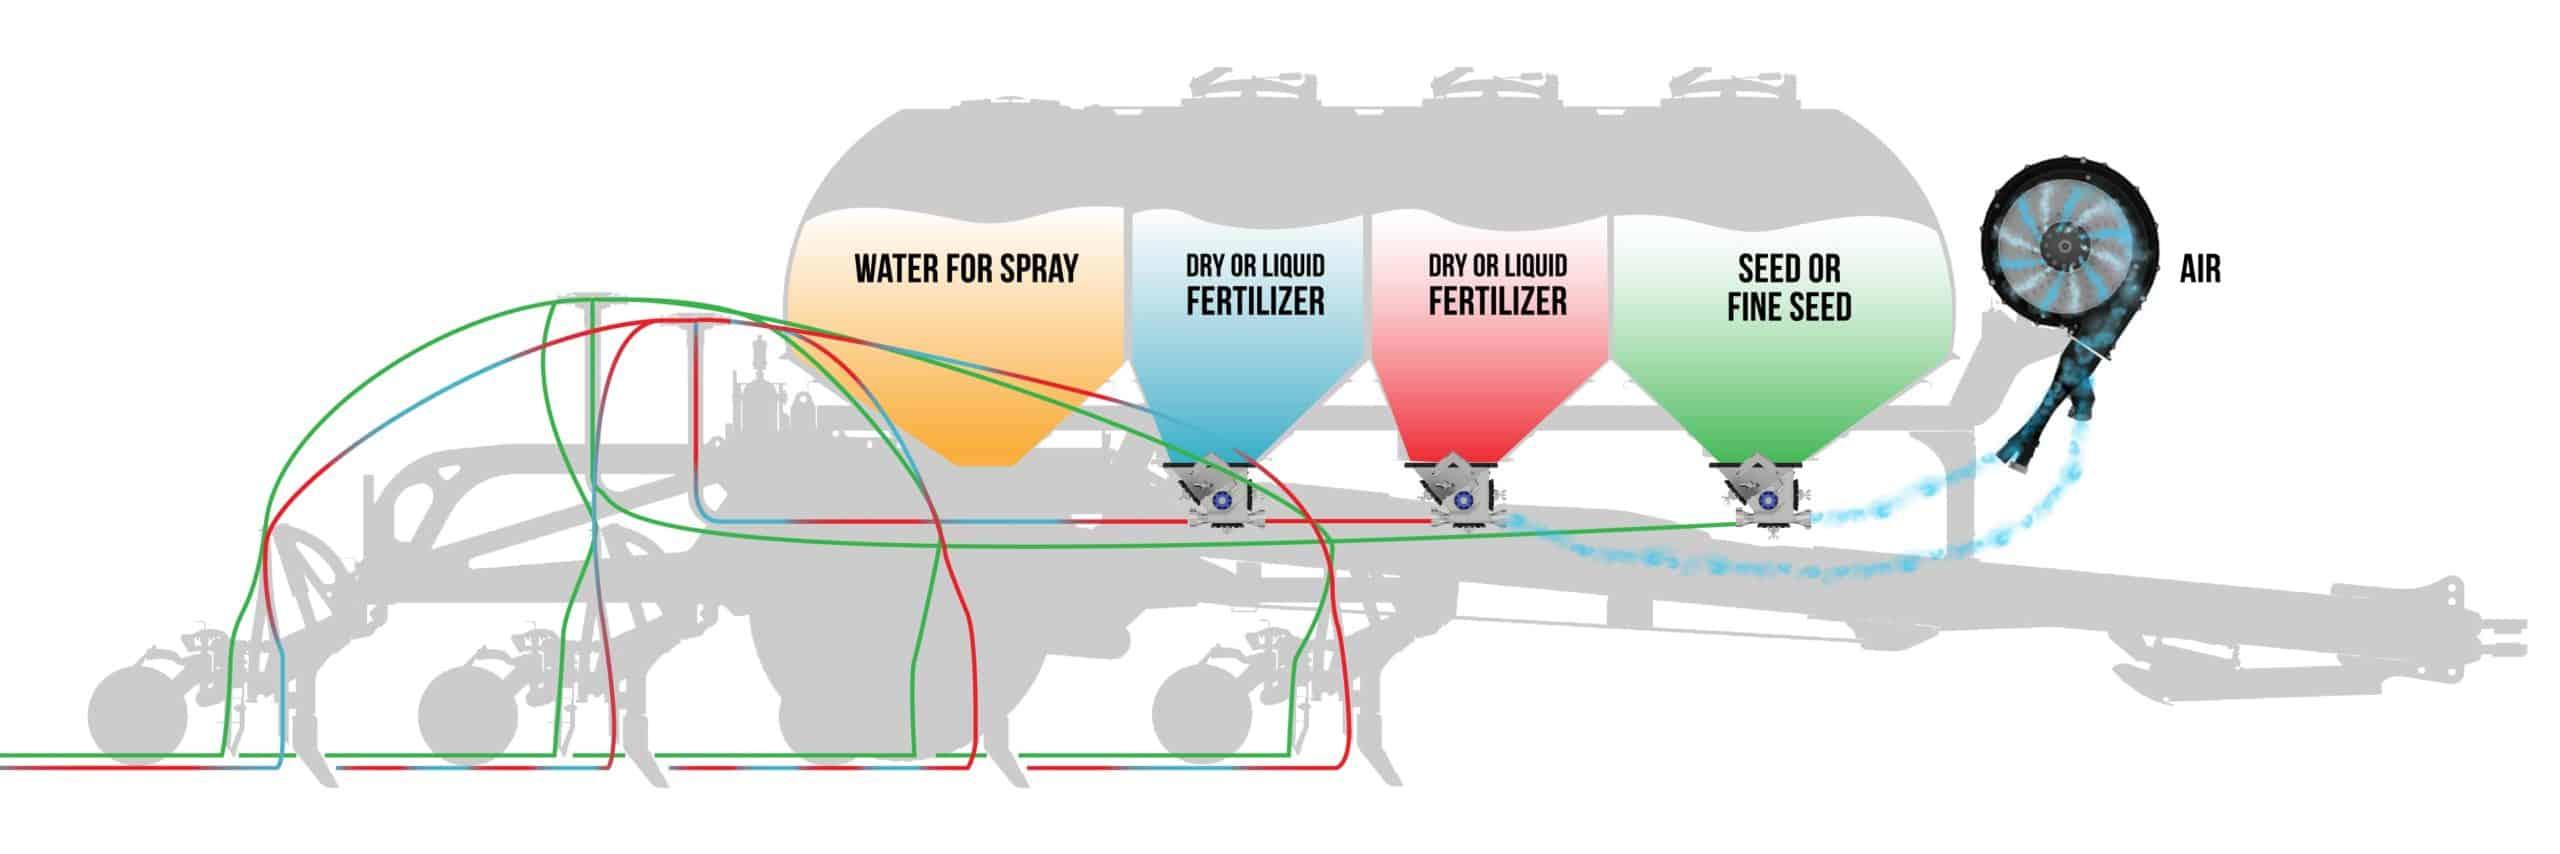 Equalizer Tine Hopper seed and fertilizer distribution